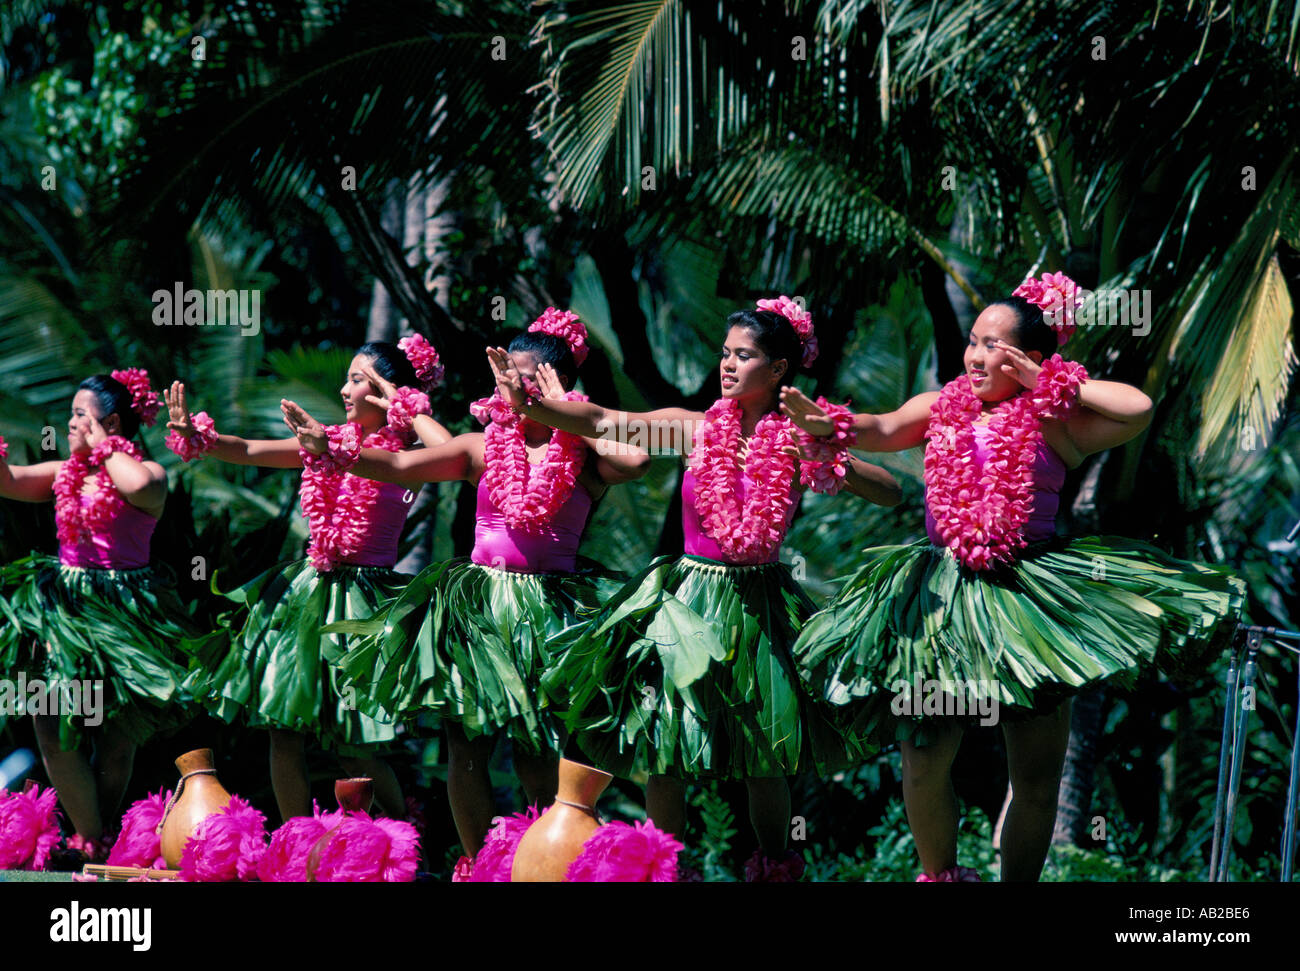 Five hula dancers in grass skirts and pink leis perform Hula Awana modern Hula dance outdoors Haleakala Hawaii - Stock Image